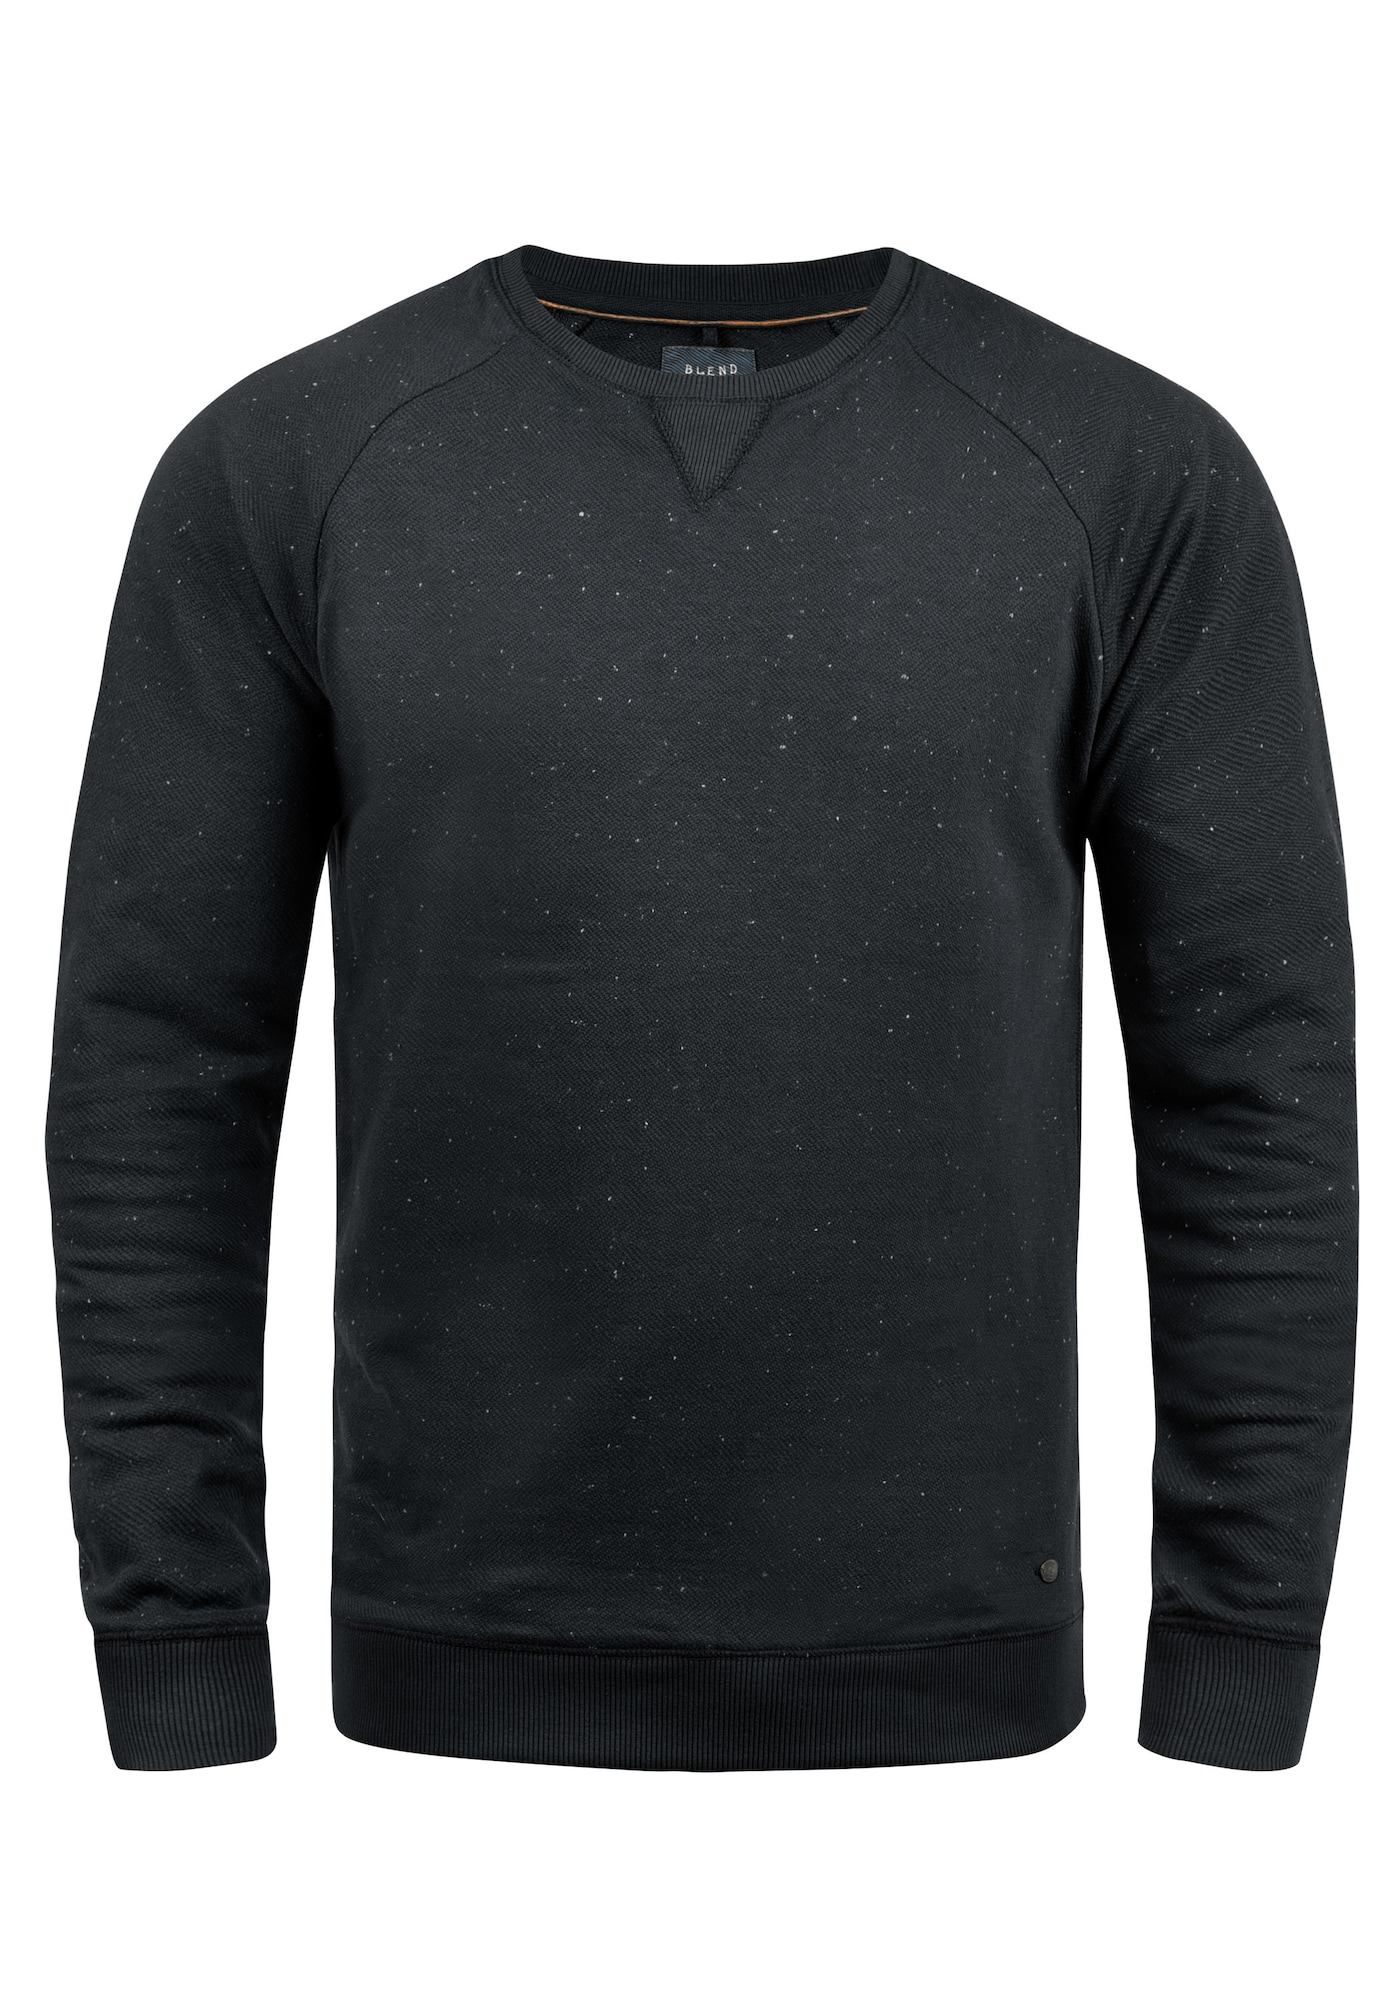 Sweatshirt 'Zlatan' | Bekleidung > Sweatshirts & -jacken | Blend